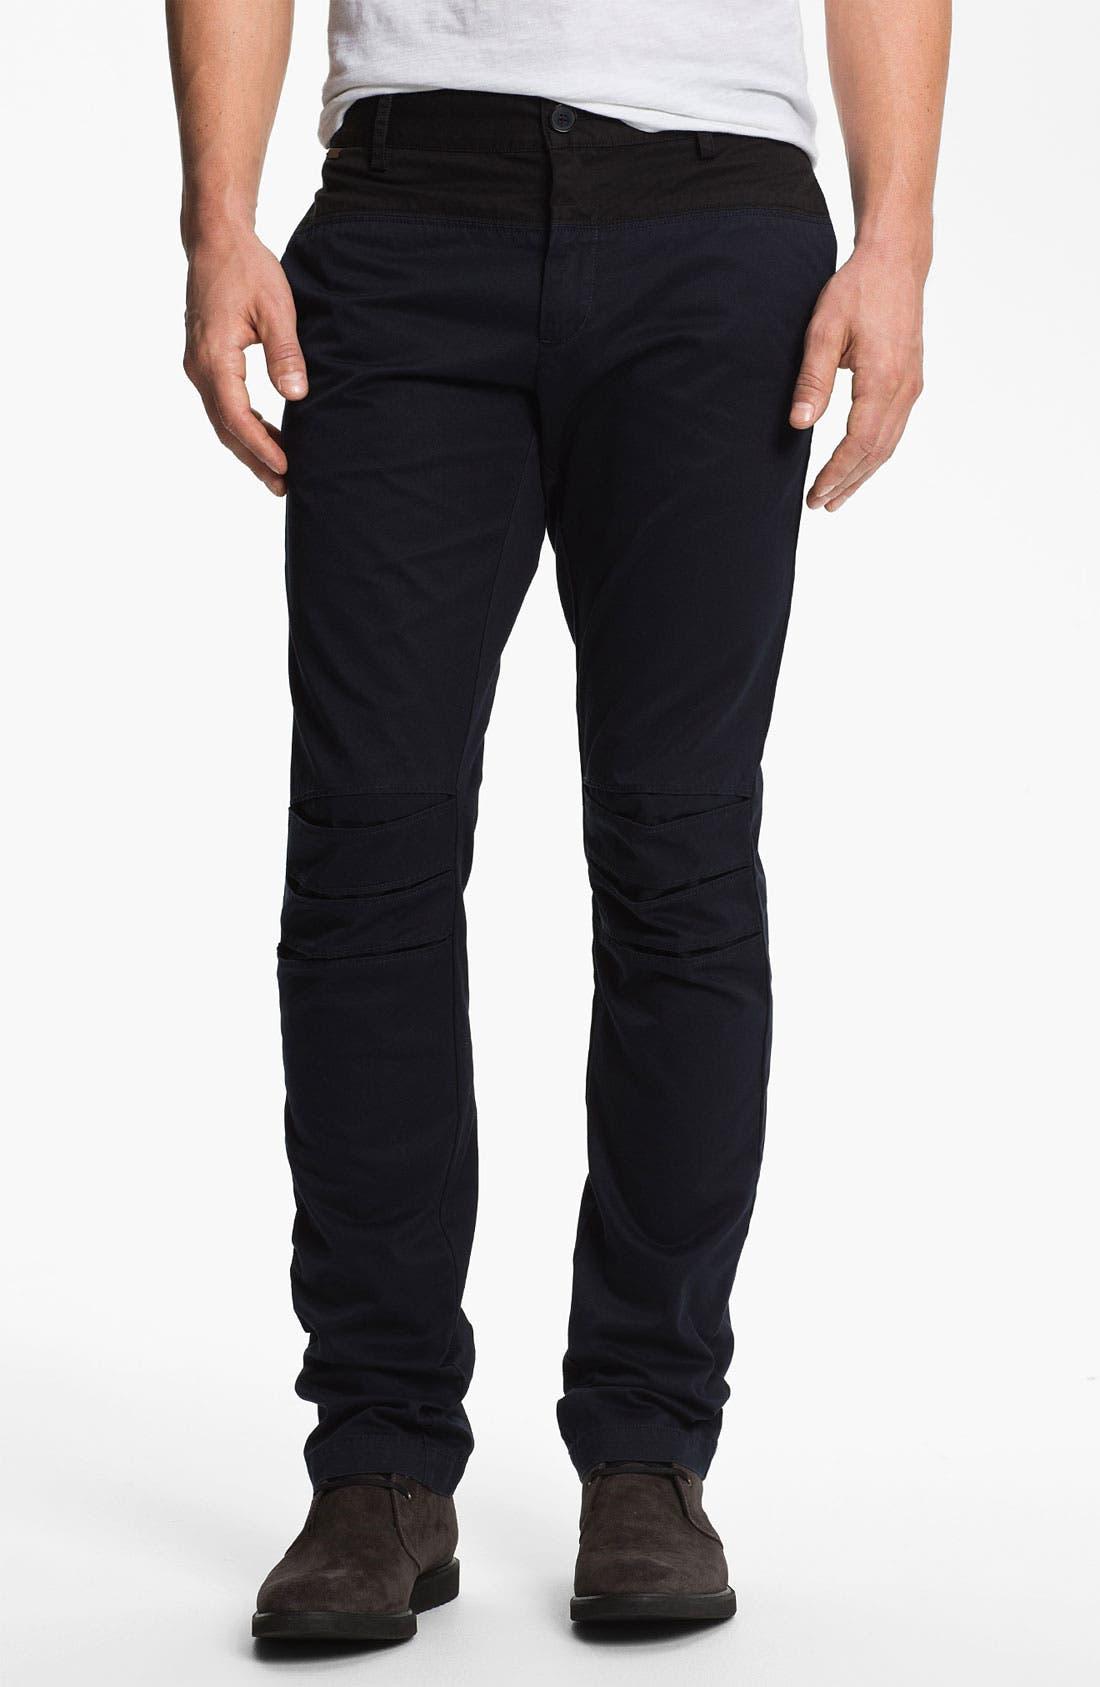 Alternate Image 1 Selected - adidas SLVR Slim Flat Front Pants